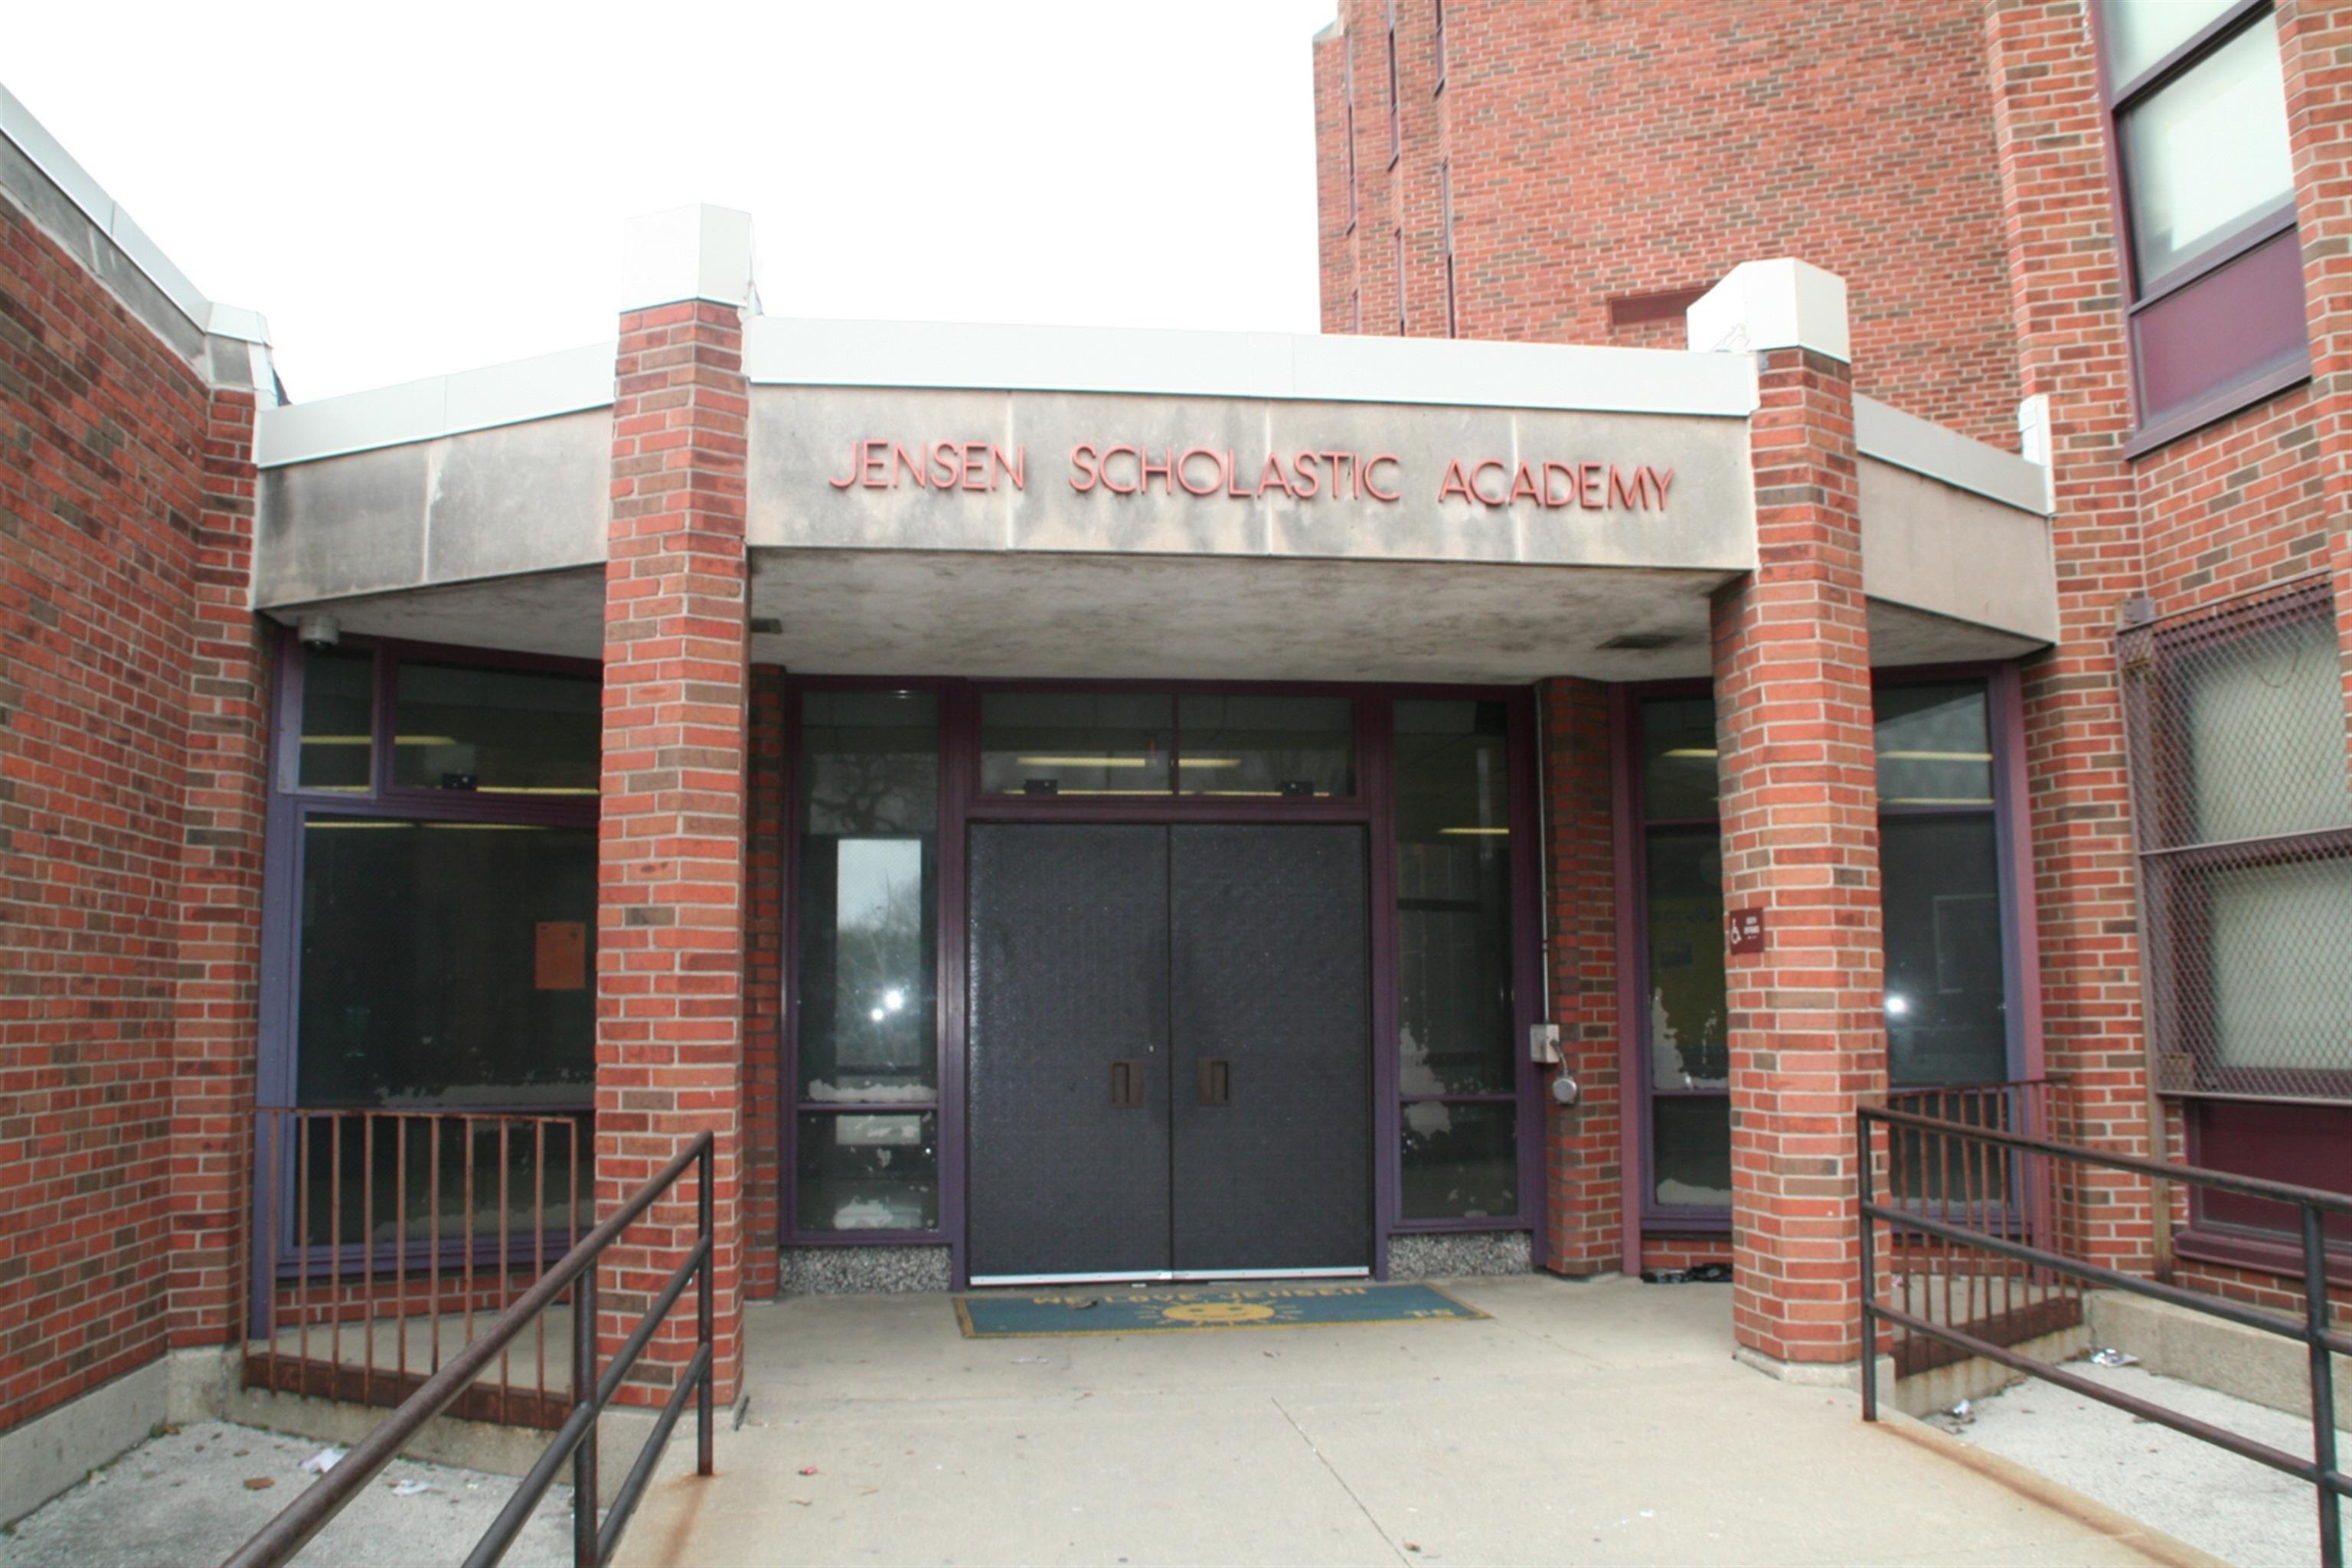 Jensen Elementary Scholastic Academy Pbc Chicago